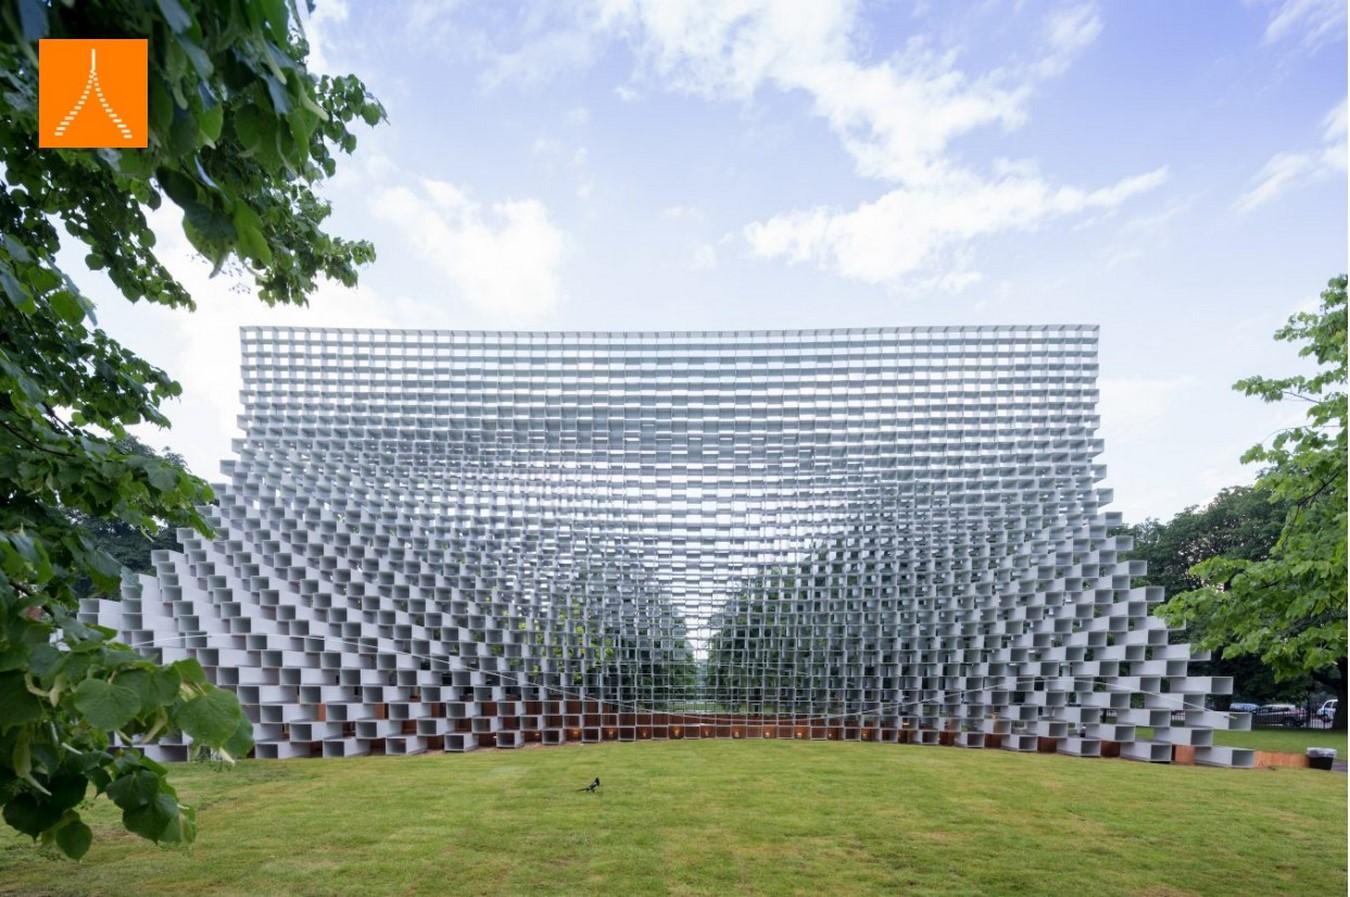 2016 Serpentine Pavilion by BIG: The unzipped walls - Sheet7